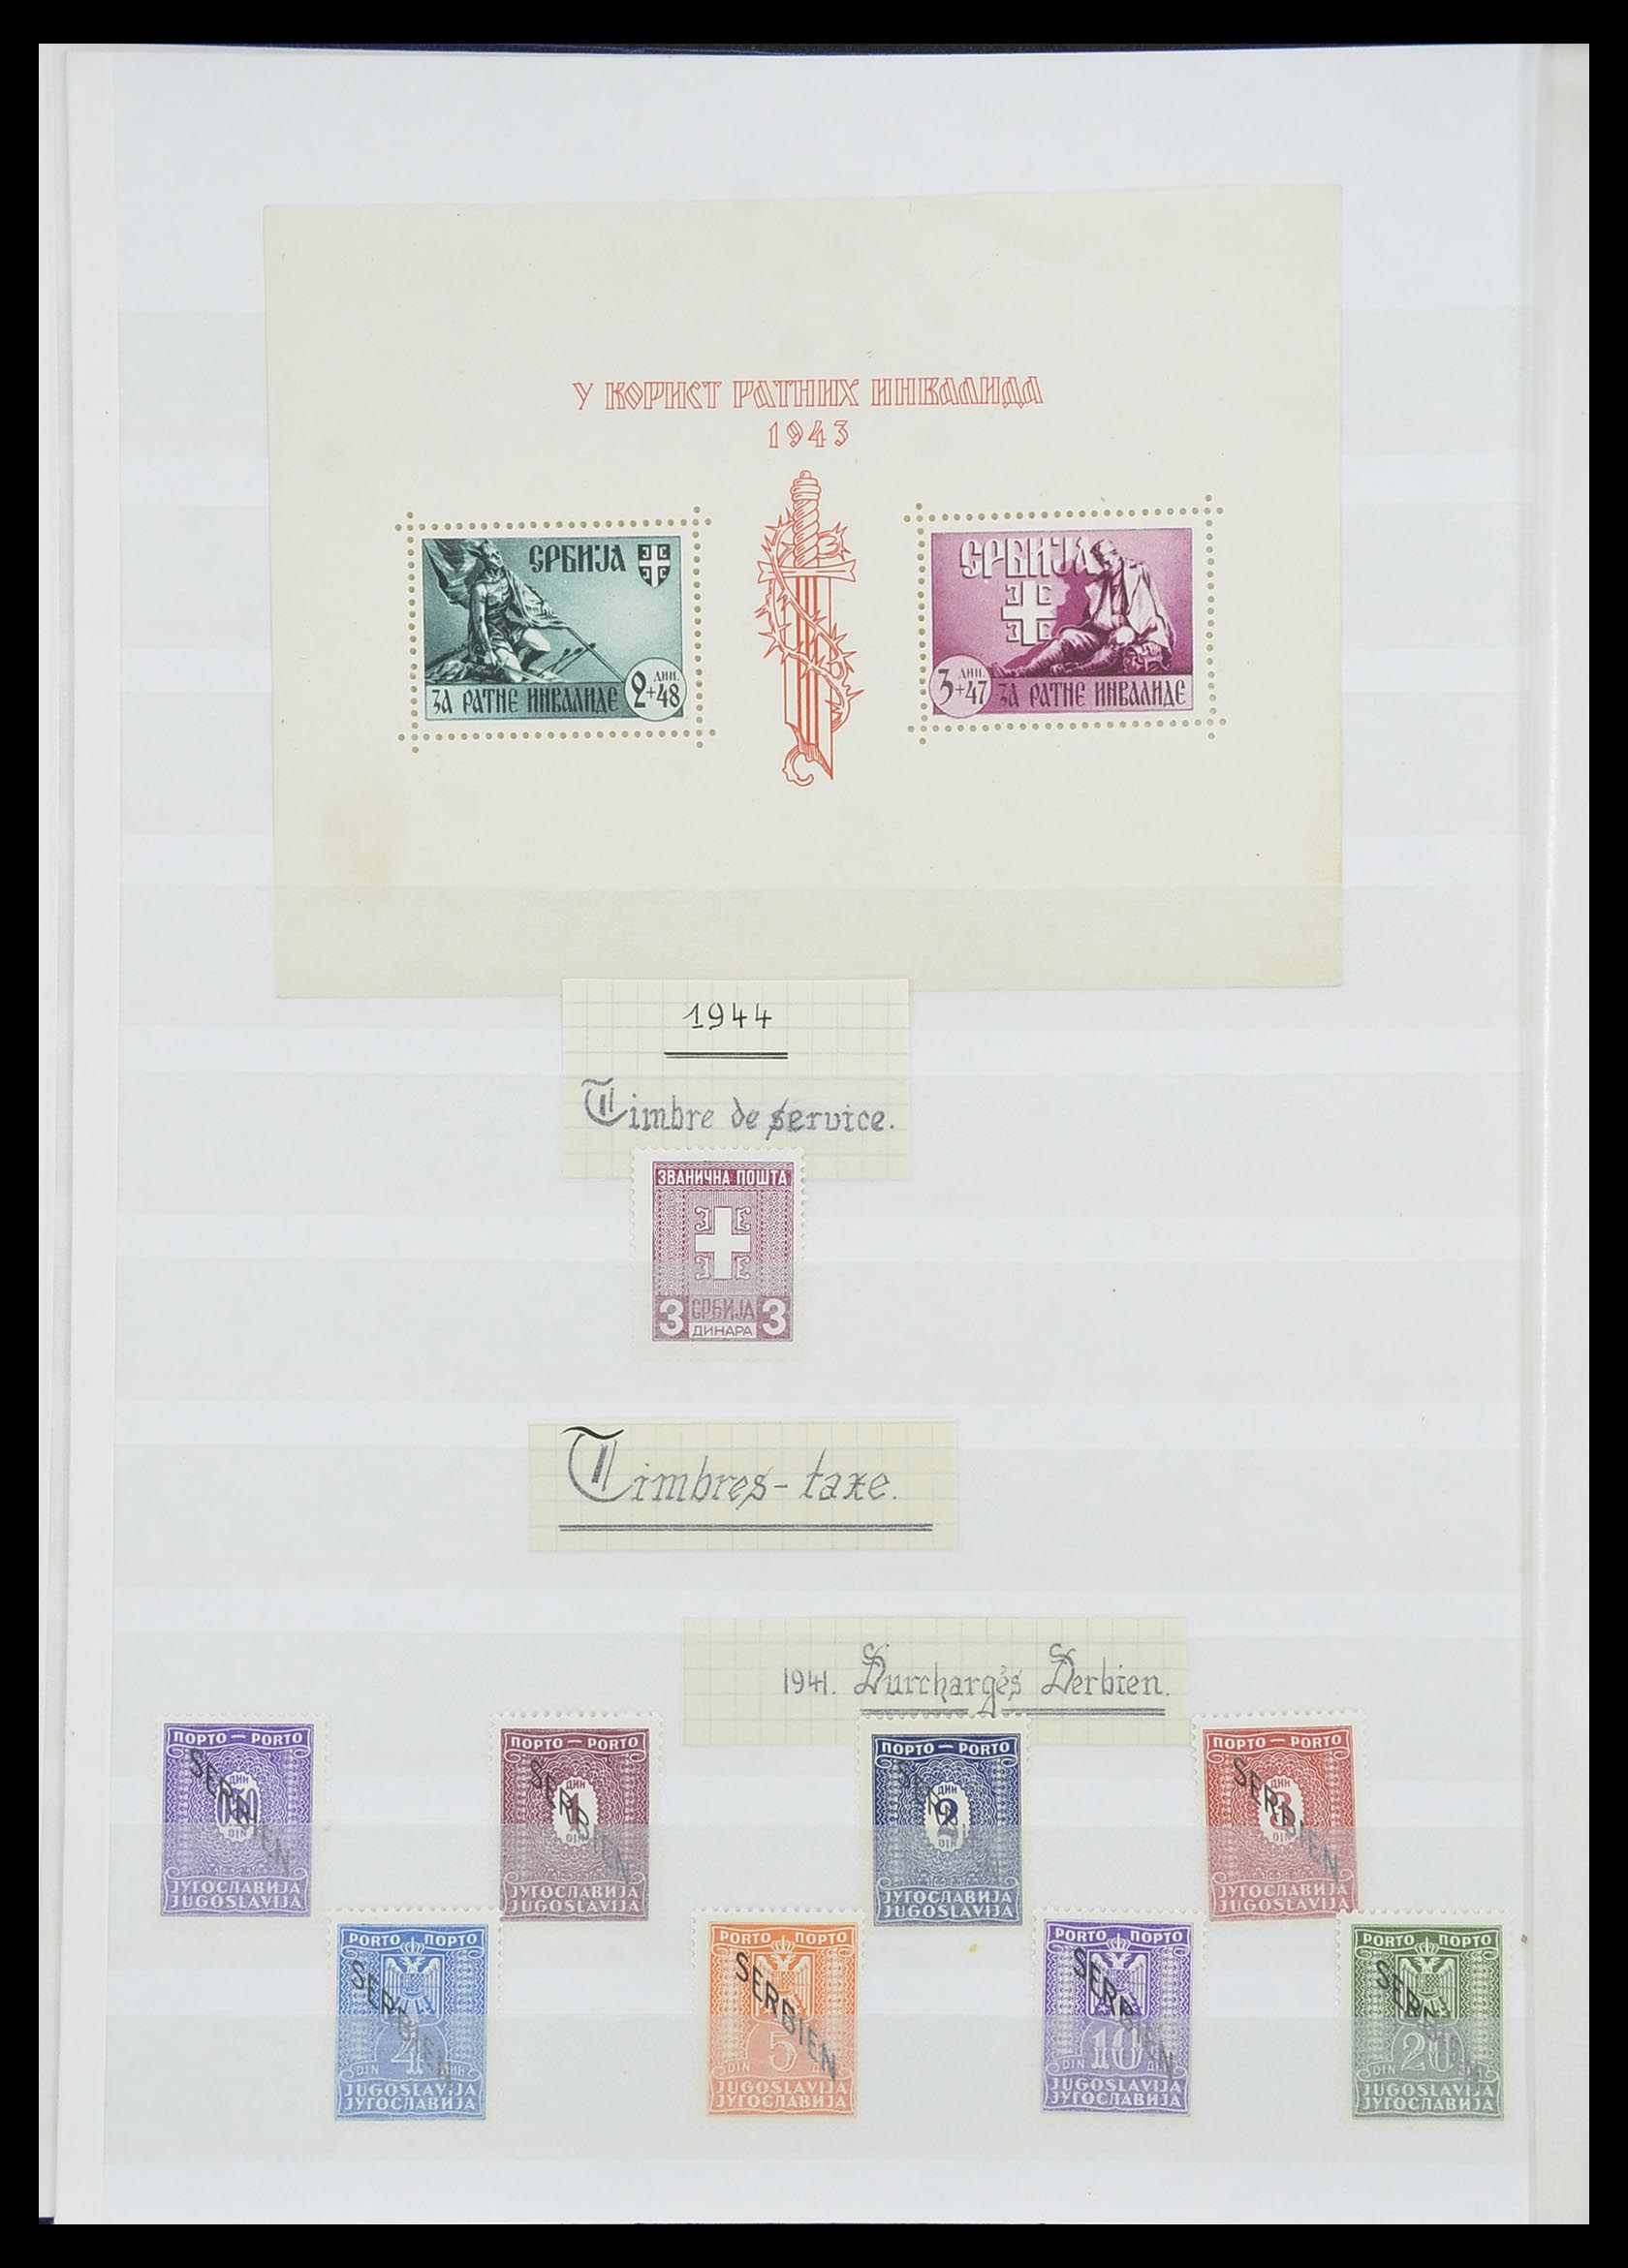 33850 020 - Postzegelverzameling 33850 Duitse bezettingen 2e wereldoorlog 1939-19